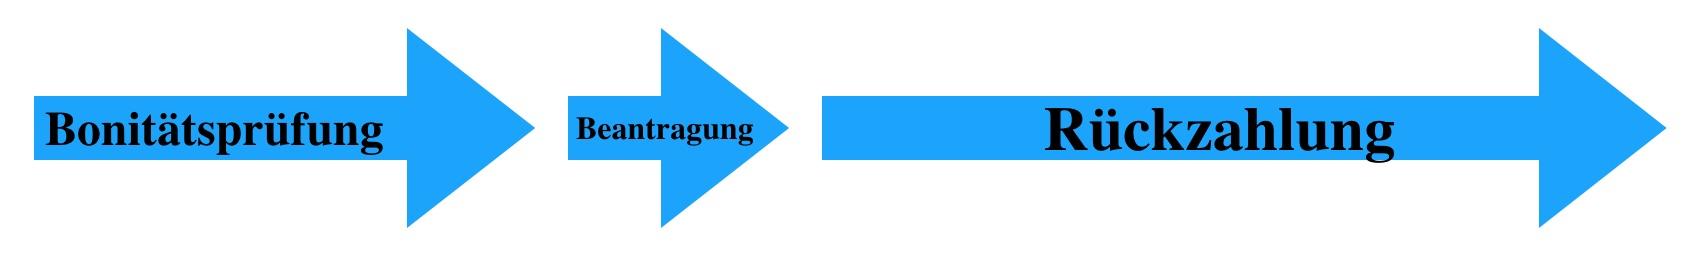 Phasen des Ratenkredits